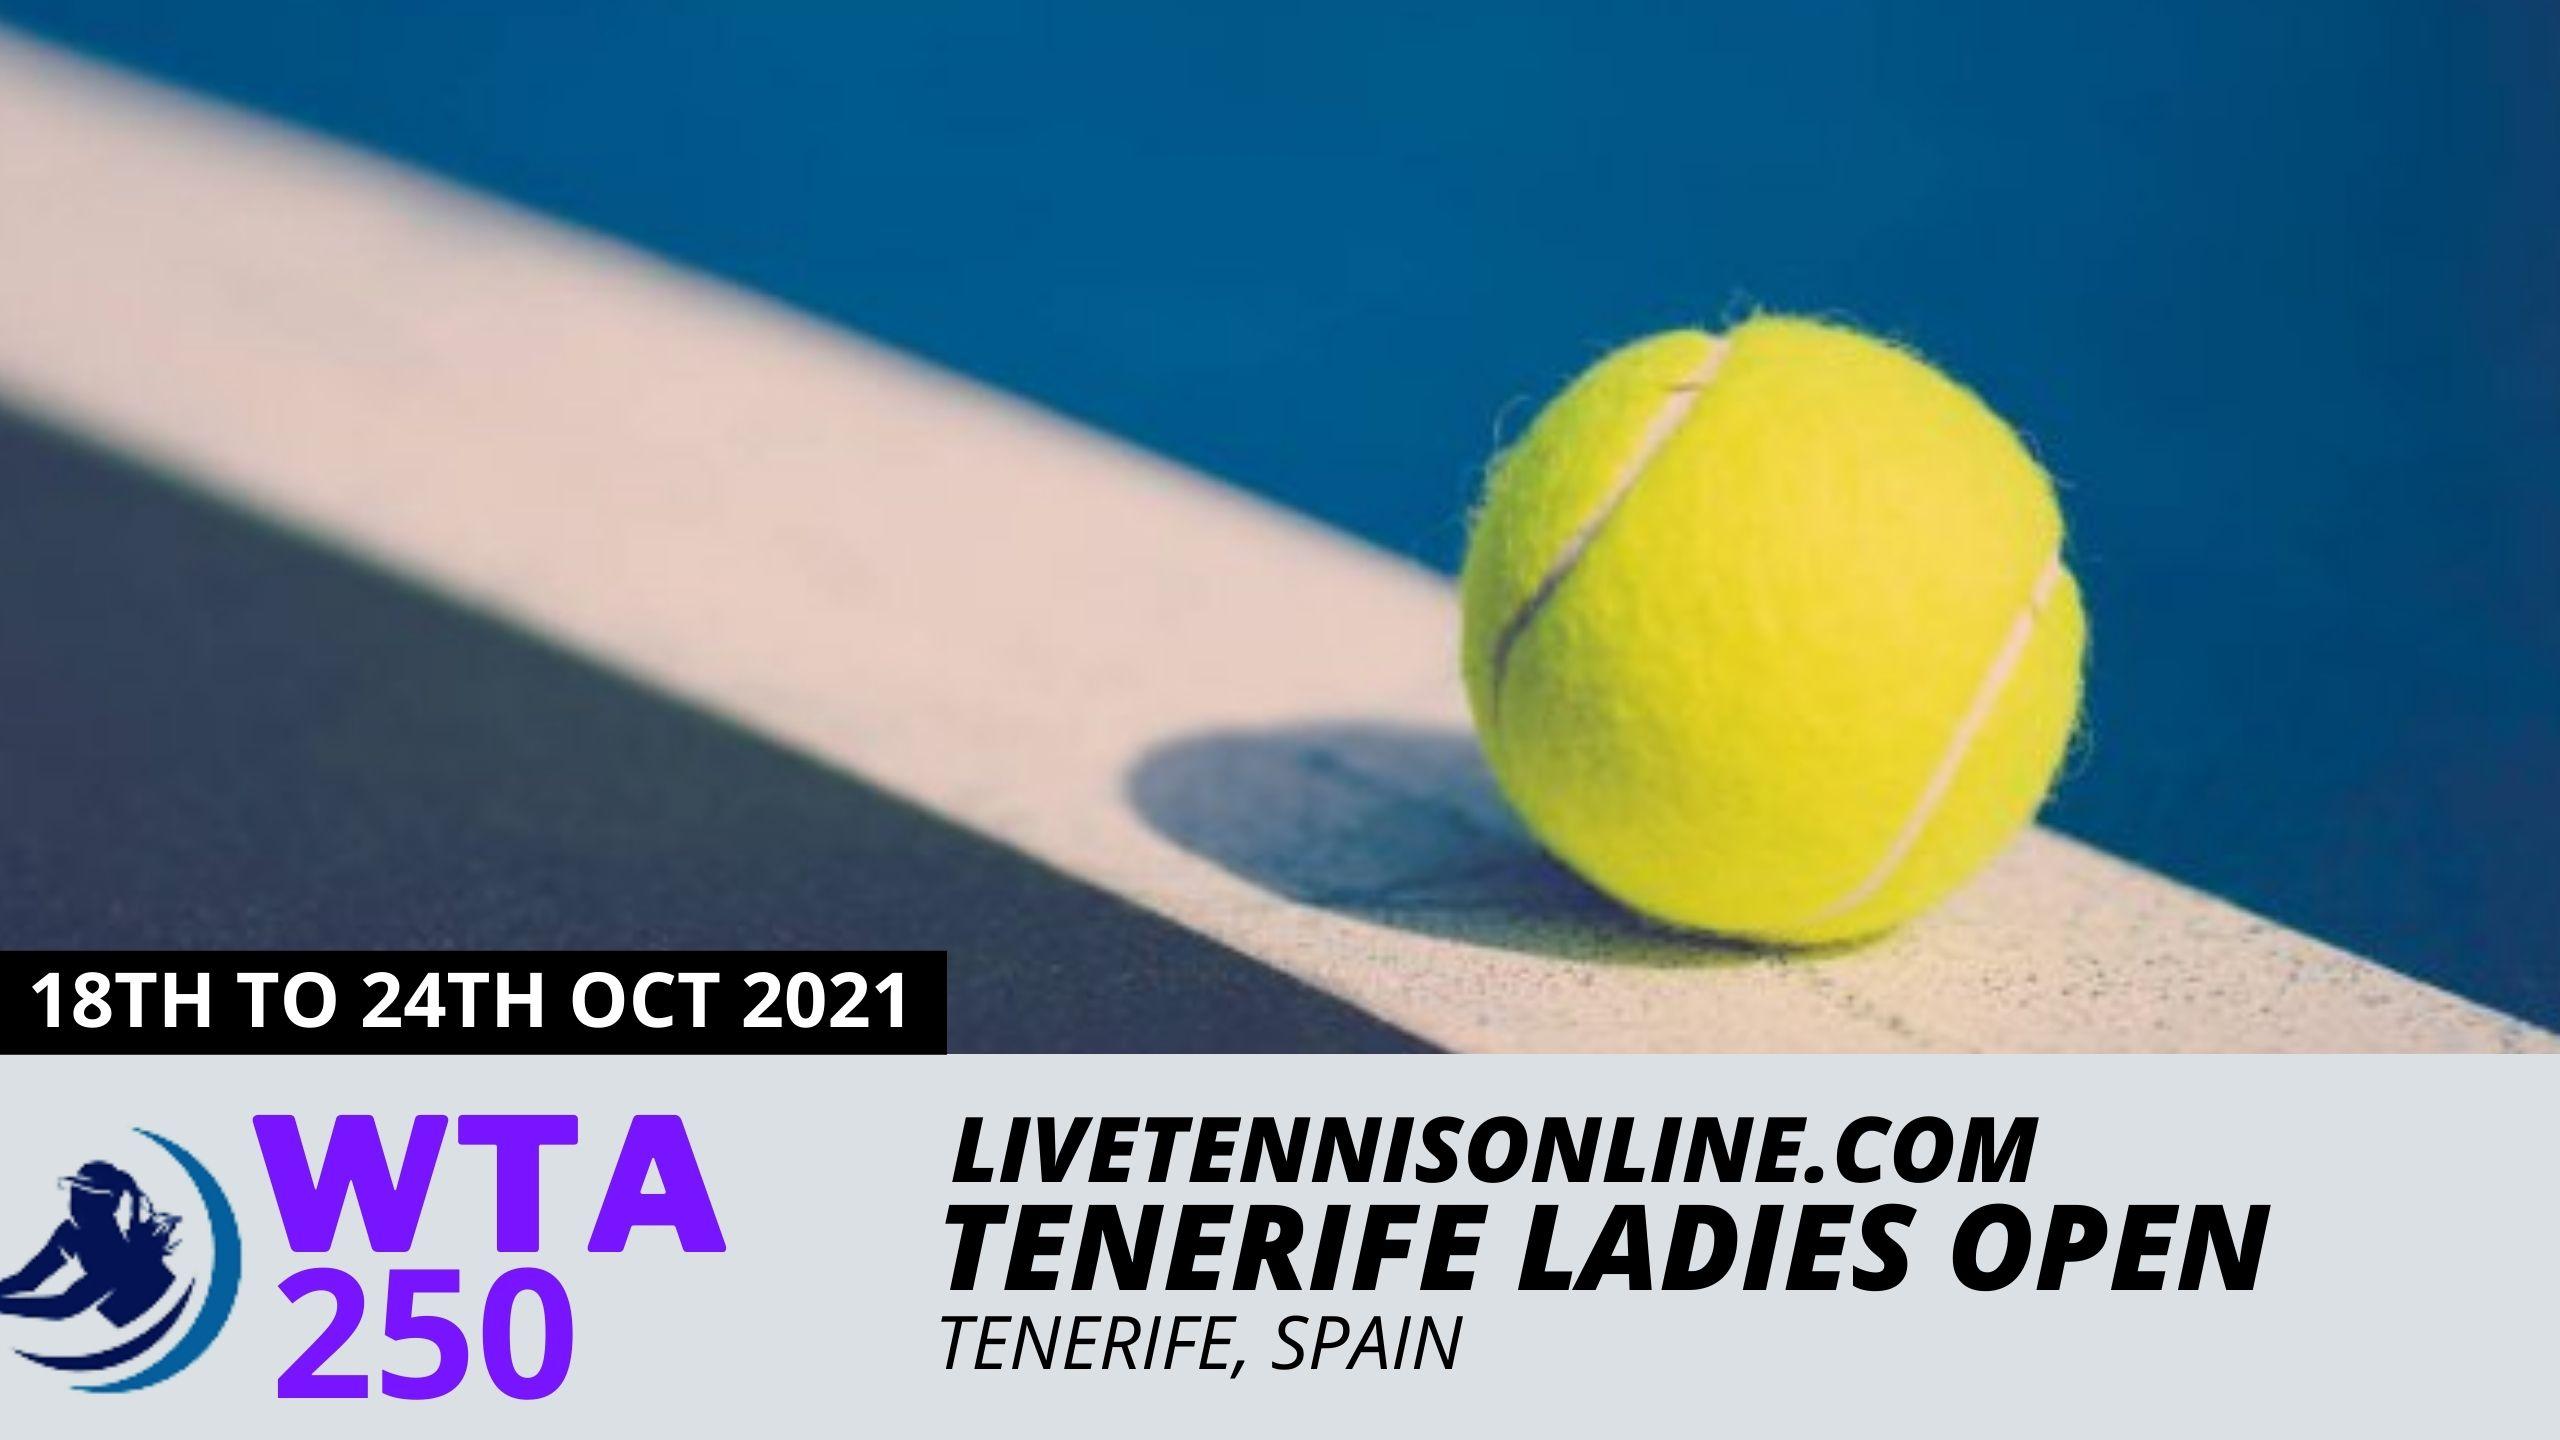 Tenerife Ladies Open Tennis Live Stream